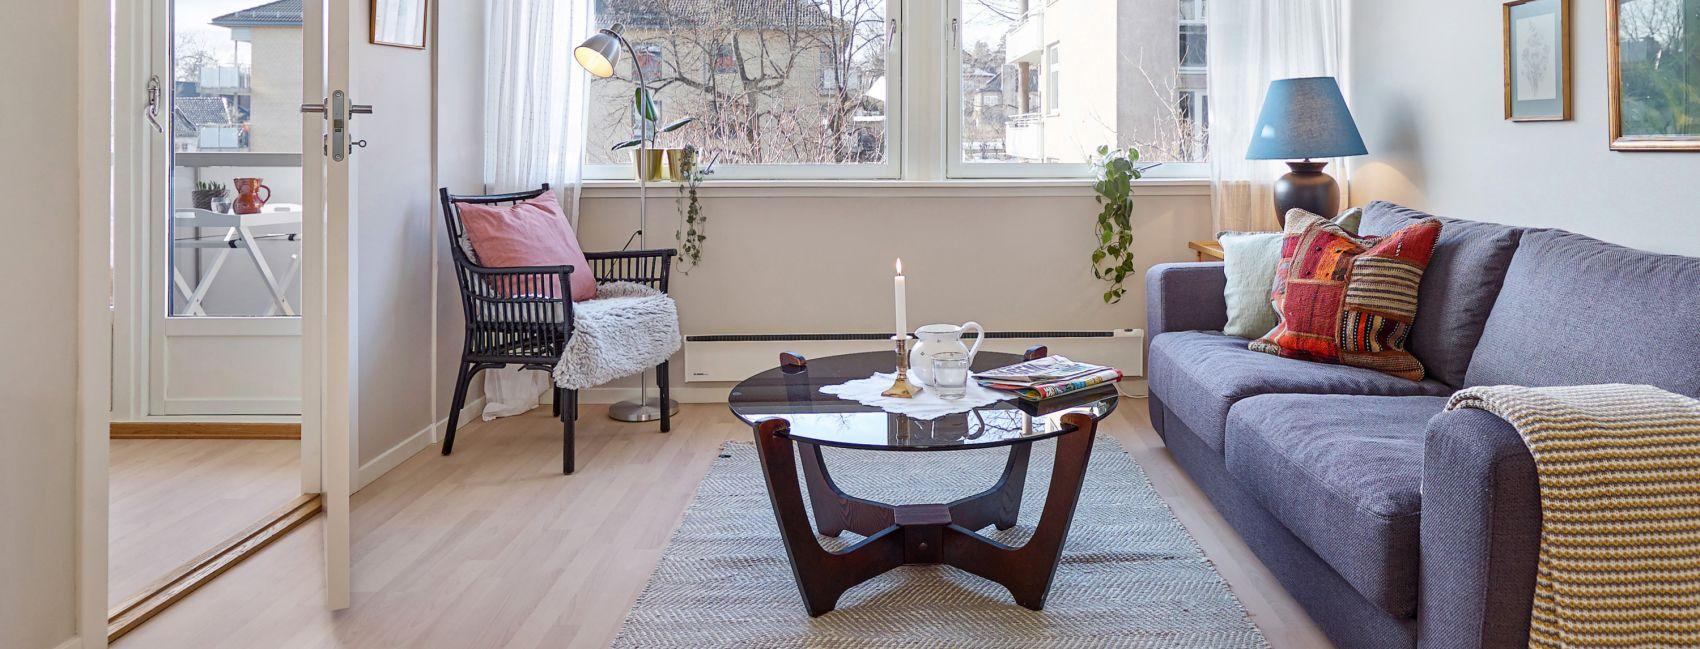 Pent møblert stue i en leilighet hos Gabels Park.